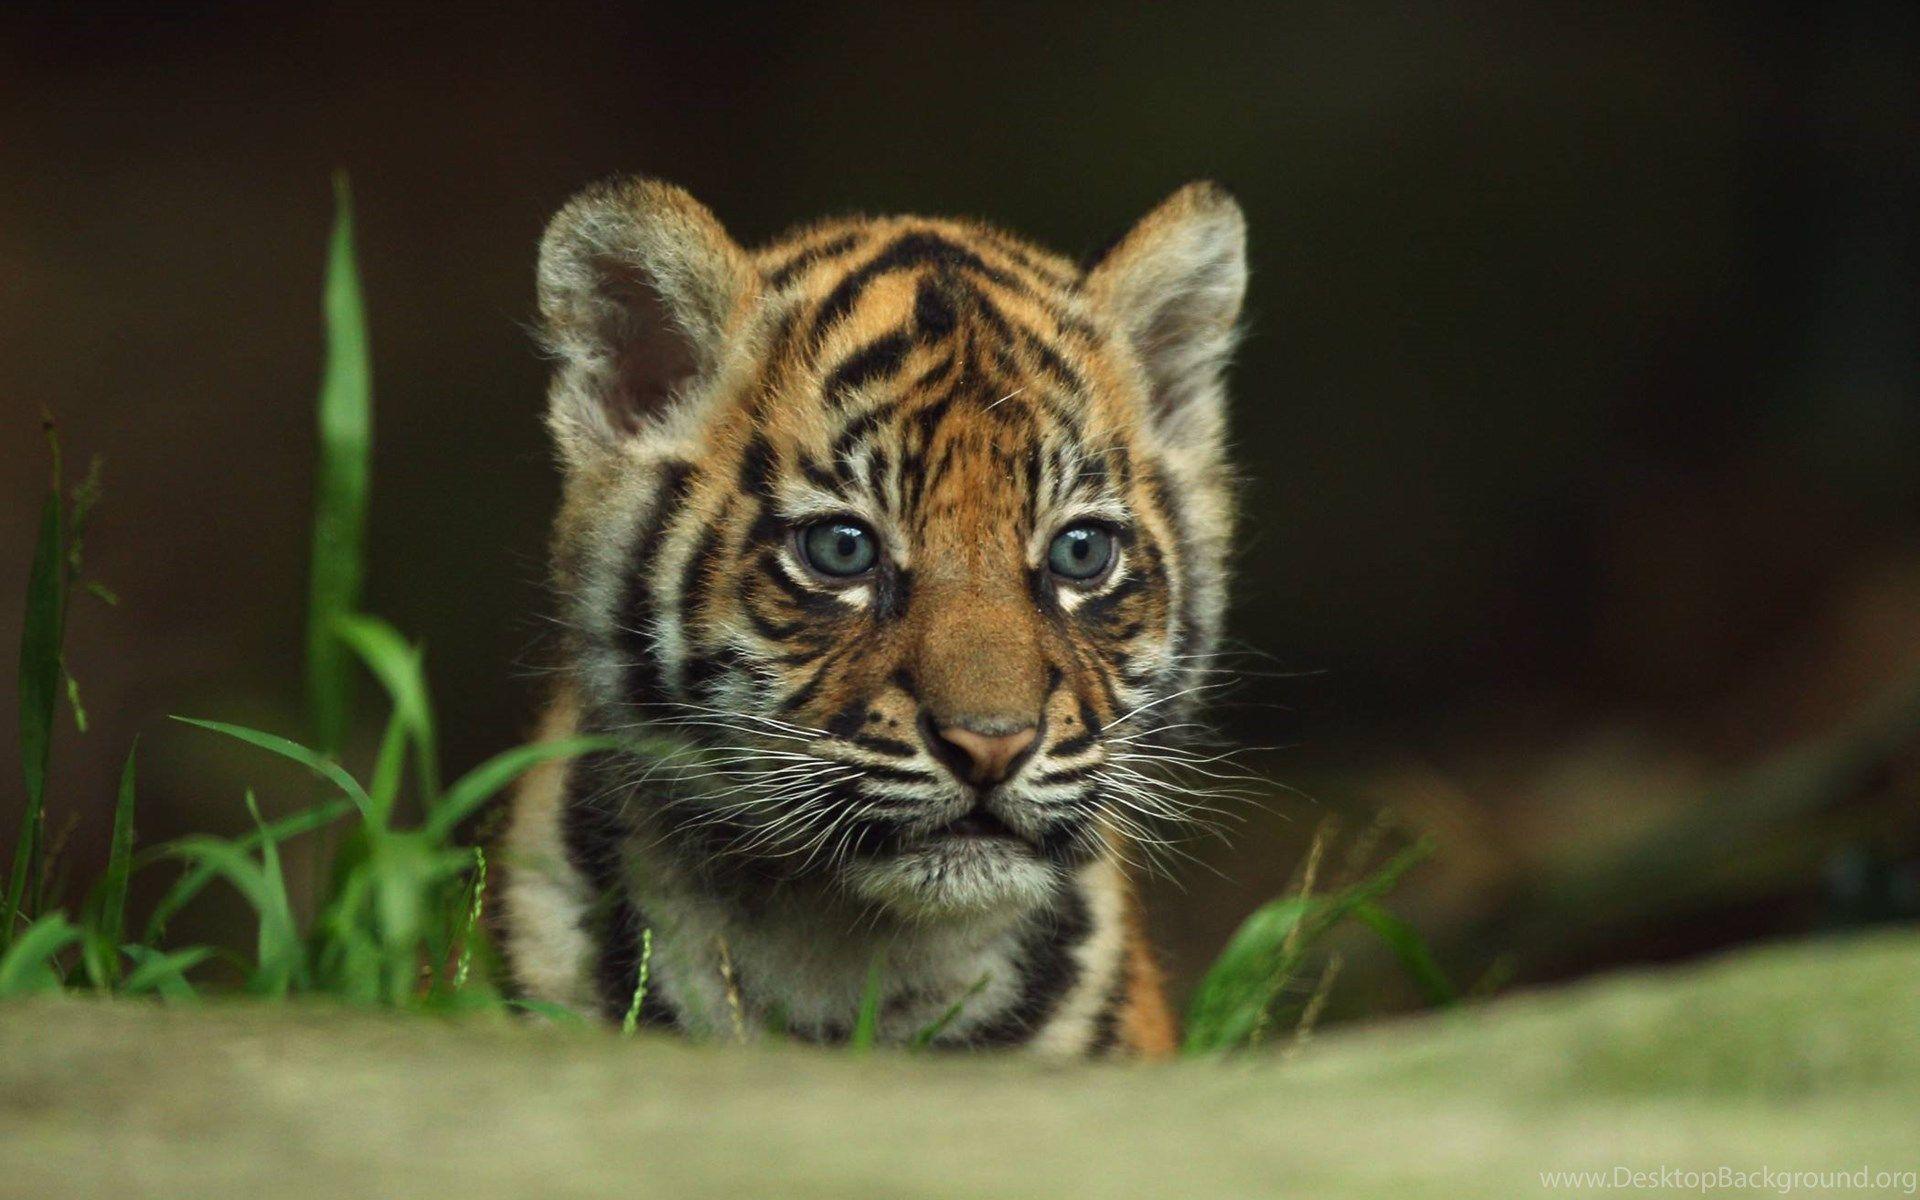 Tiger Baby, Cool Wallpaper